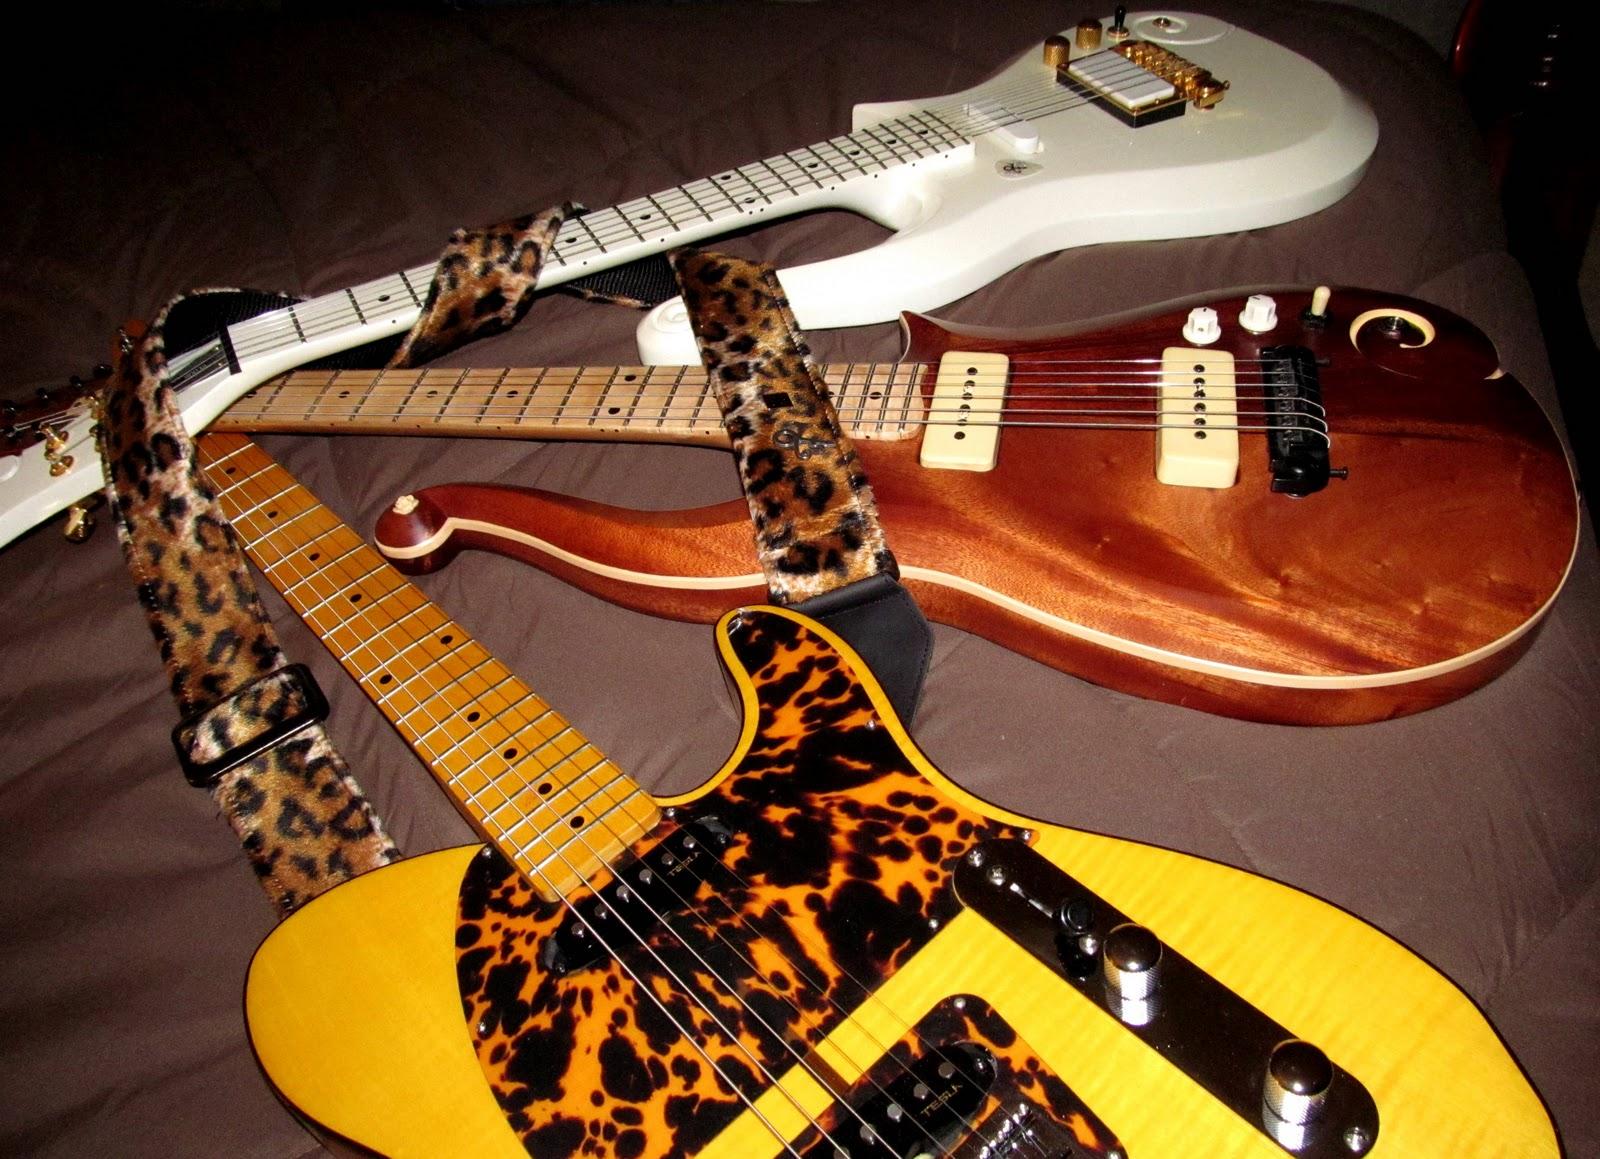 Cloud guitar forum httpamazongetm wear 2 inch guitar leoparddpb001v9k6n0refsr1sc1ieutf8qid1327287686sr8 1 spell buycottarizona